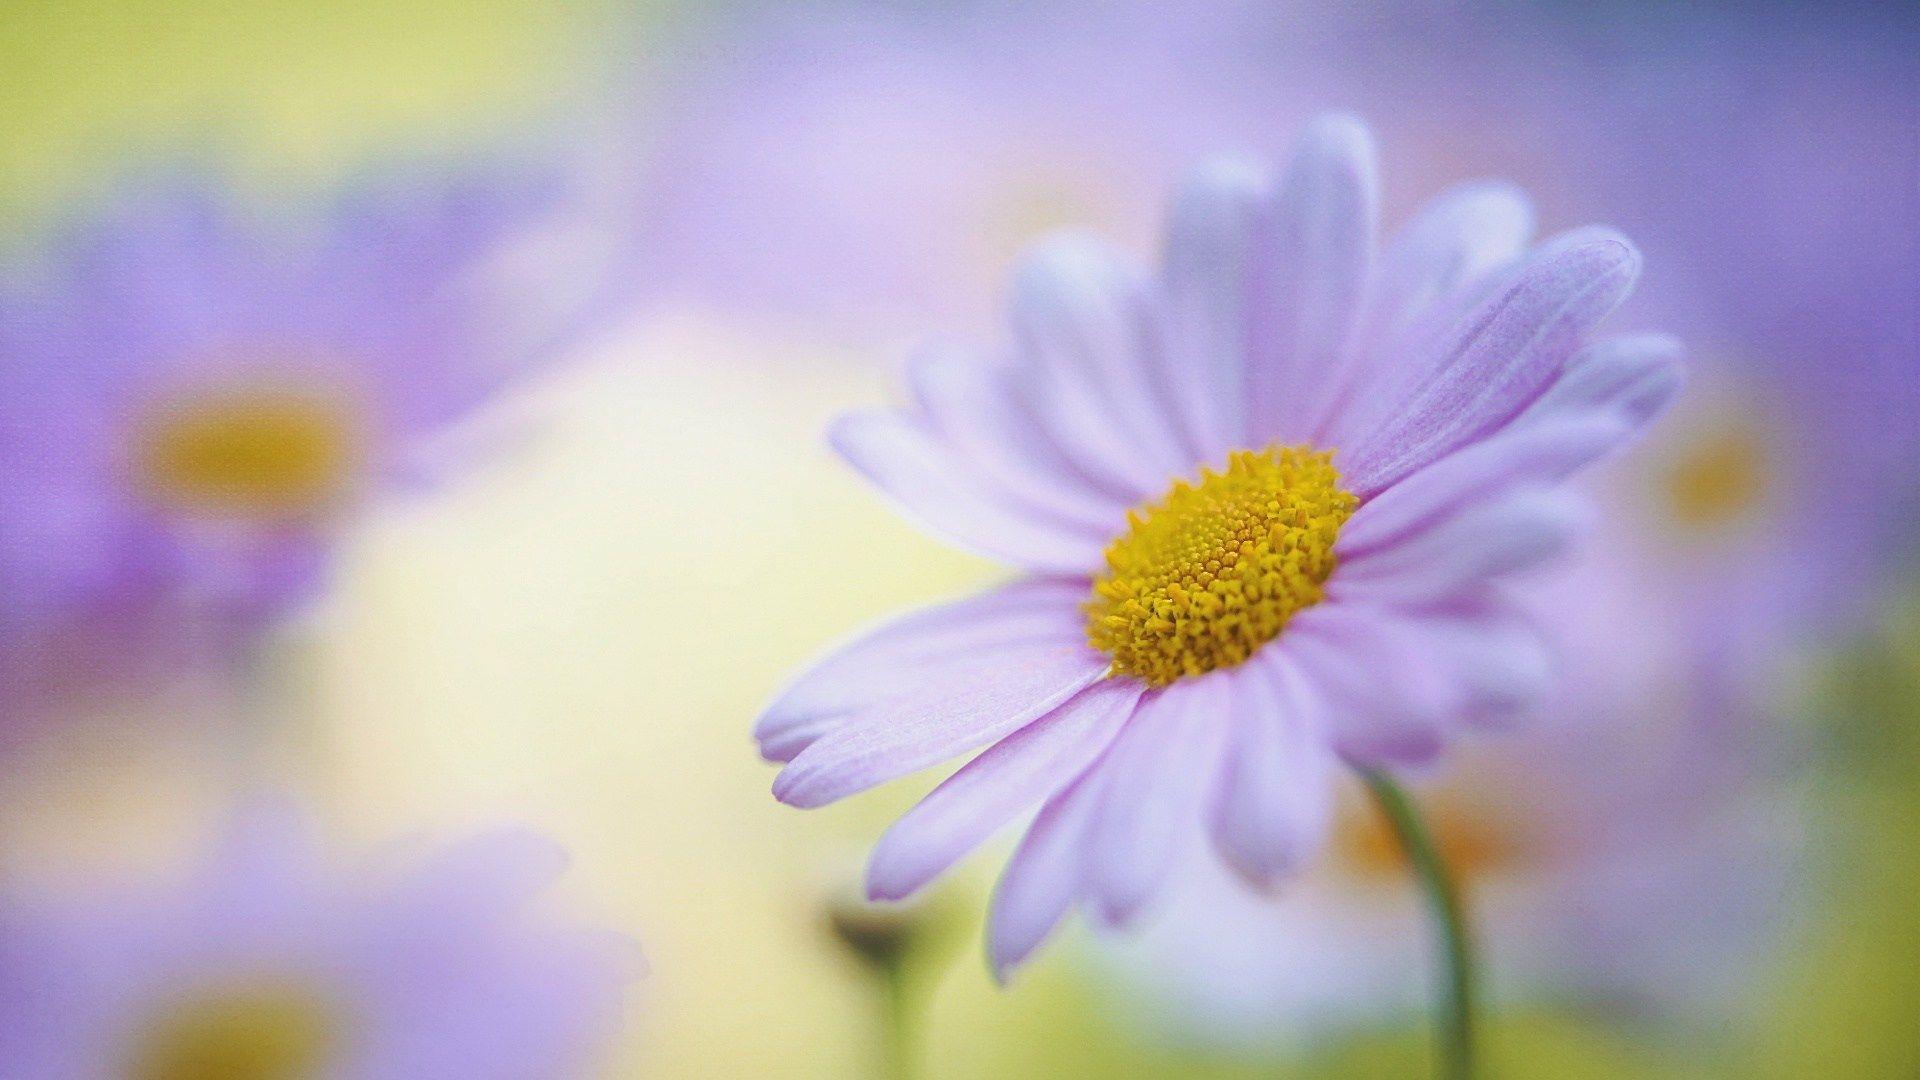 daisy flower image 4k